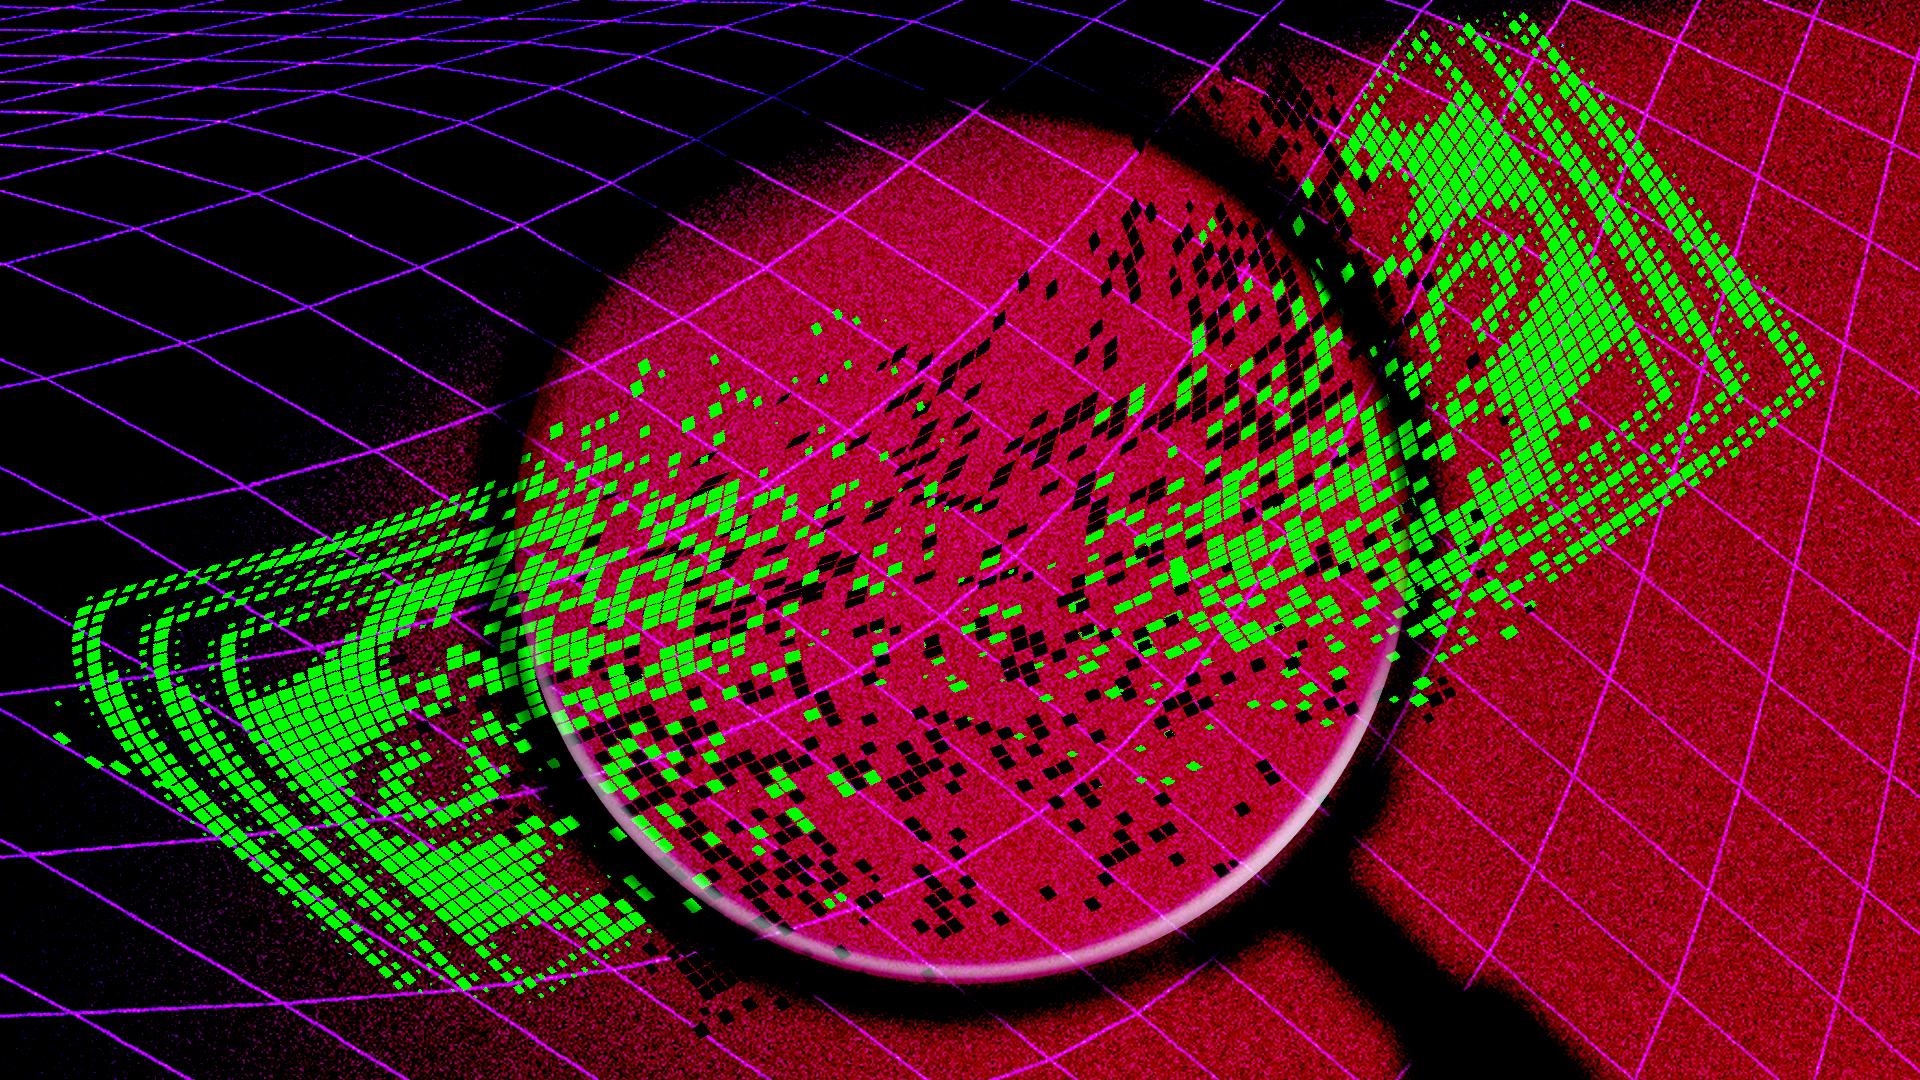 CreamFinance exploited in $18.8 million flash loan attack